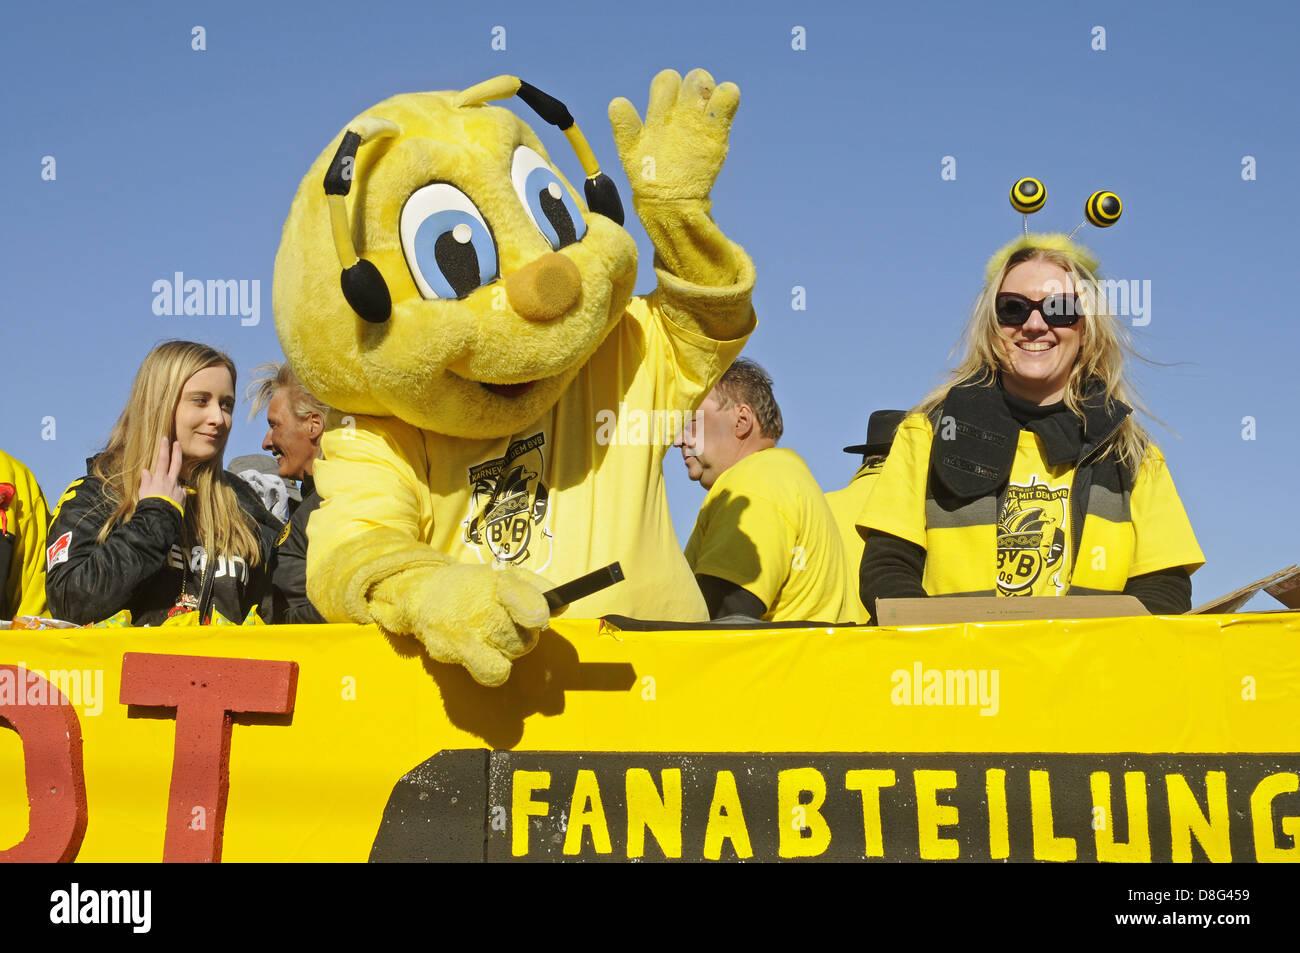 Mascot - Stock Image